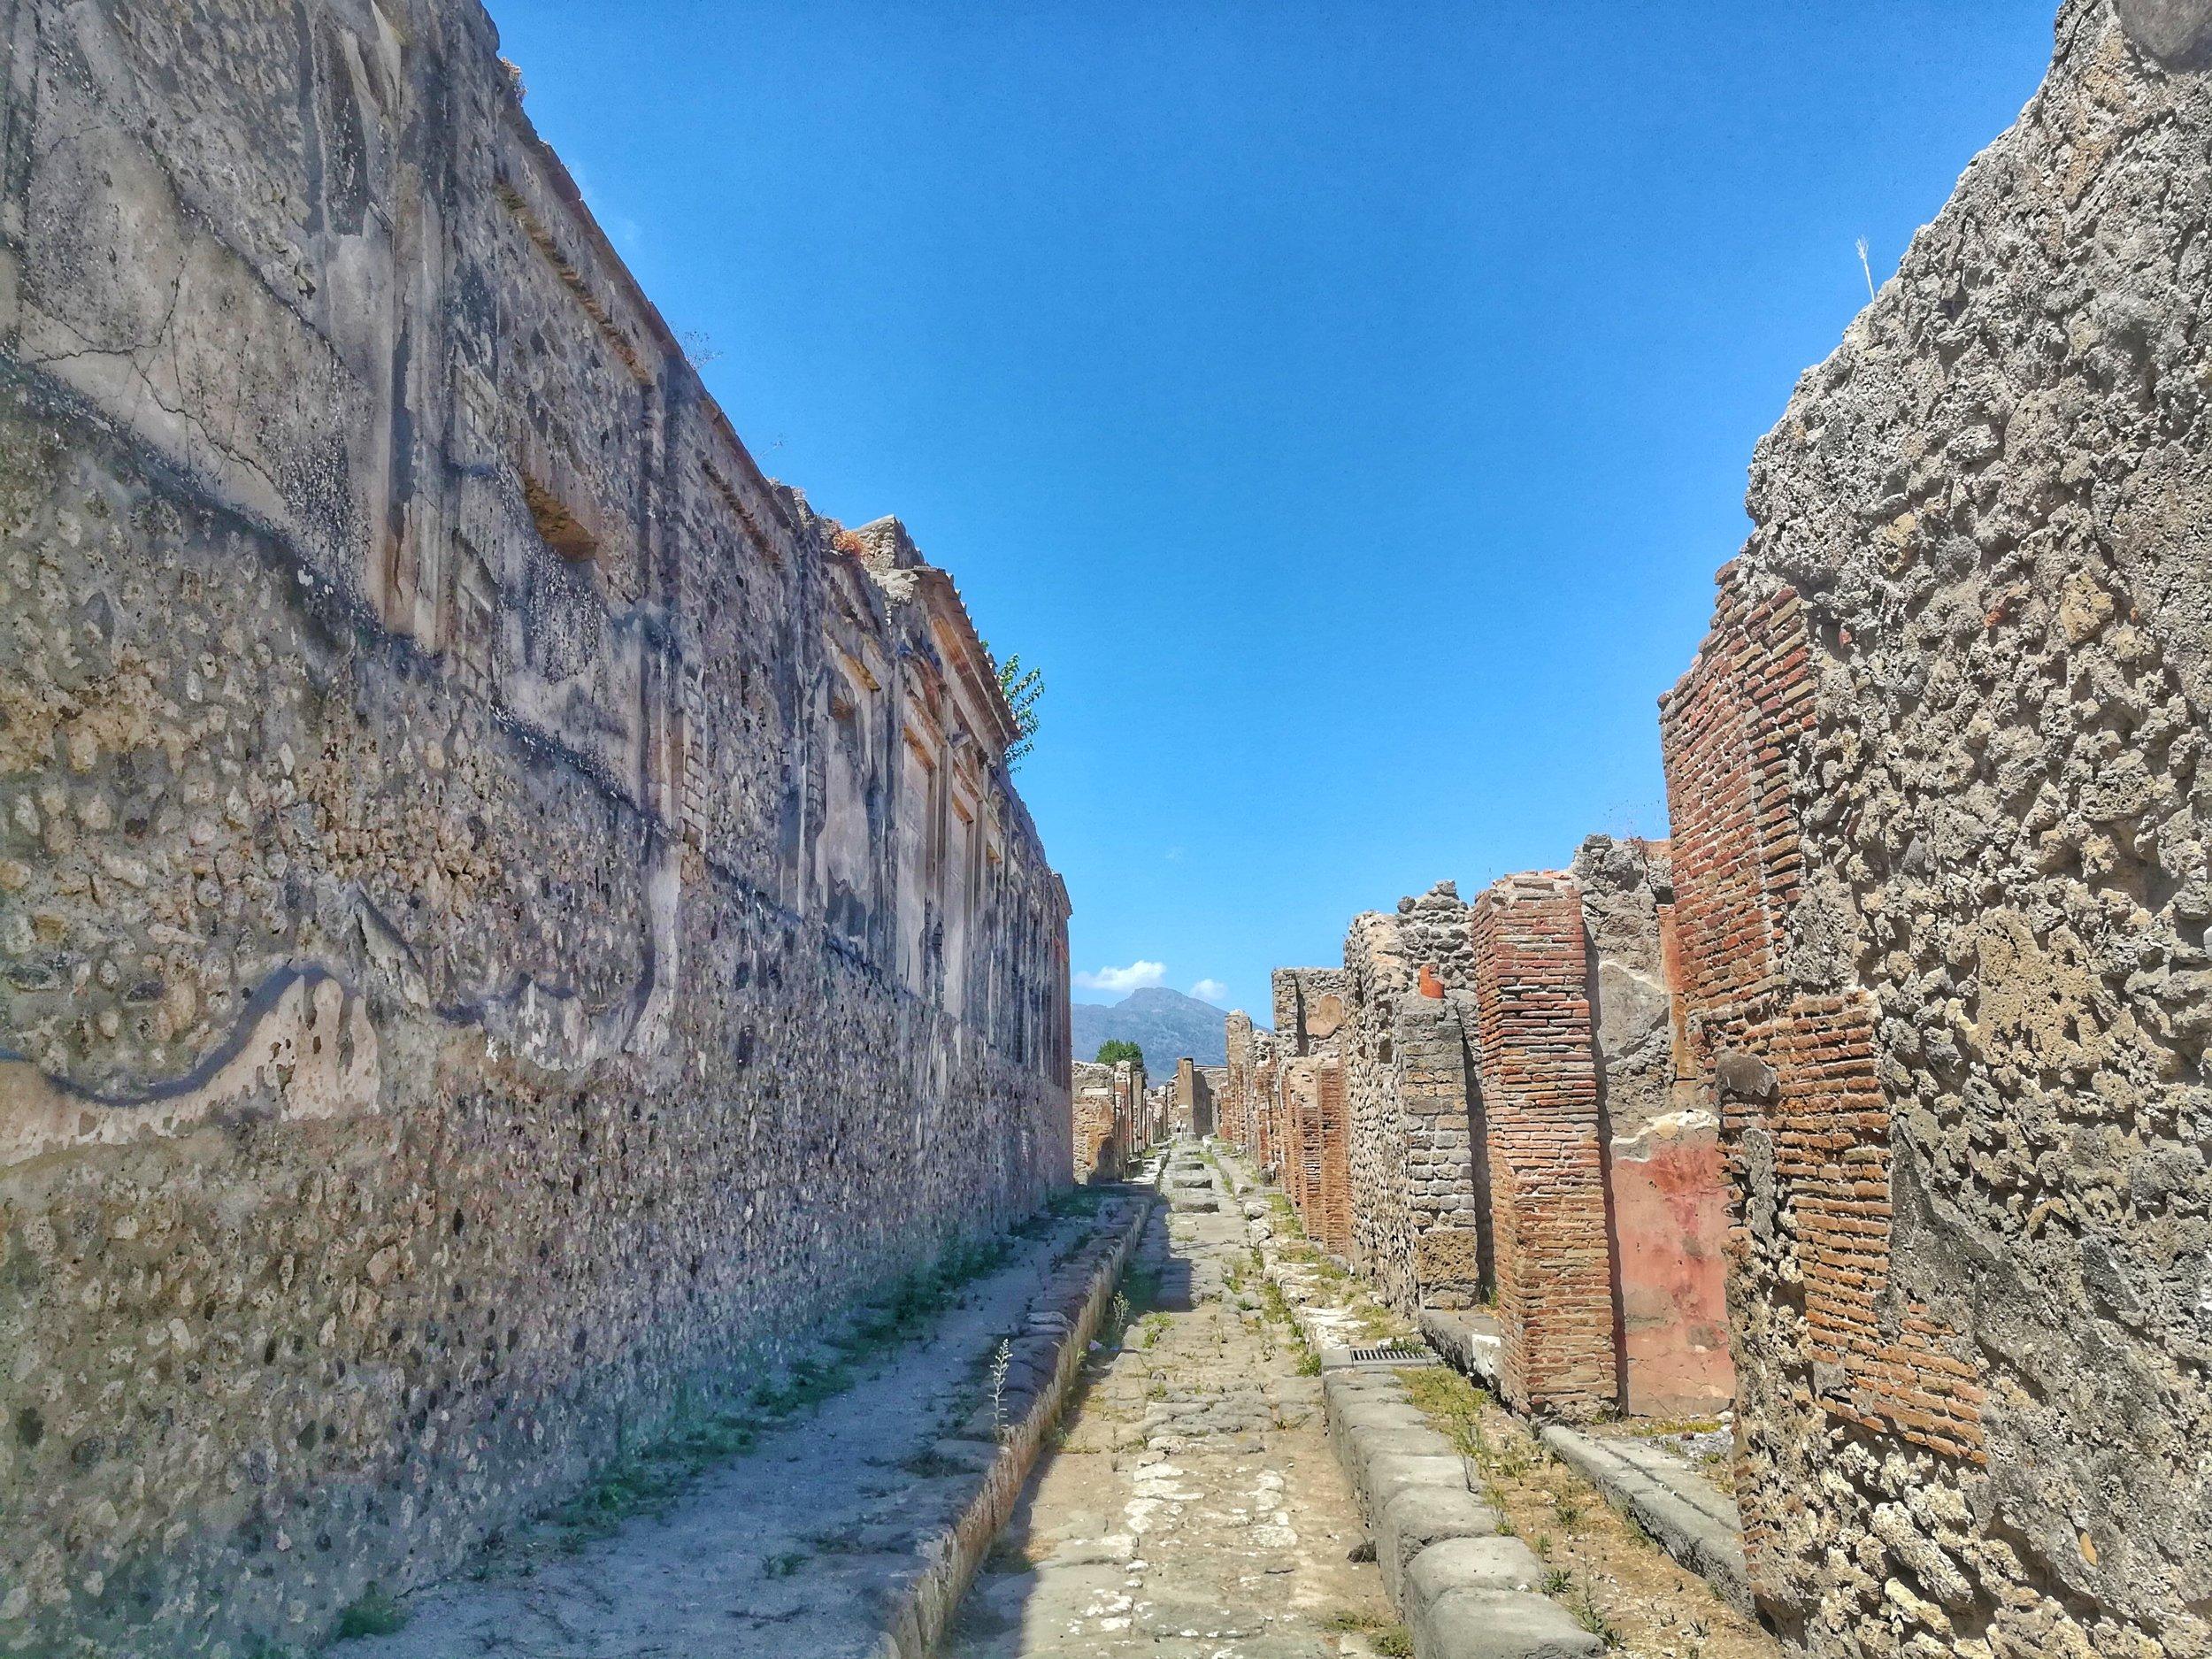 The Pompeii ruins